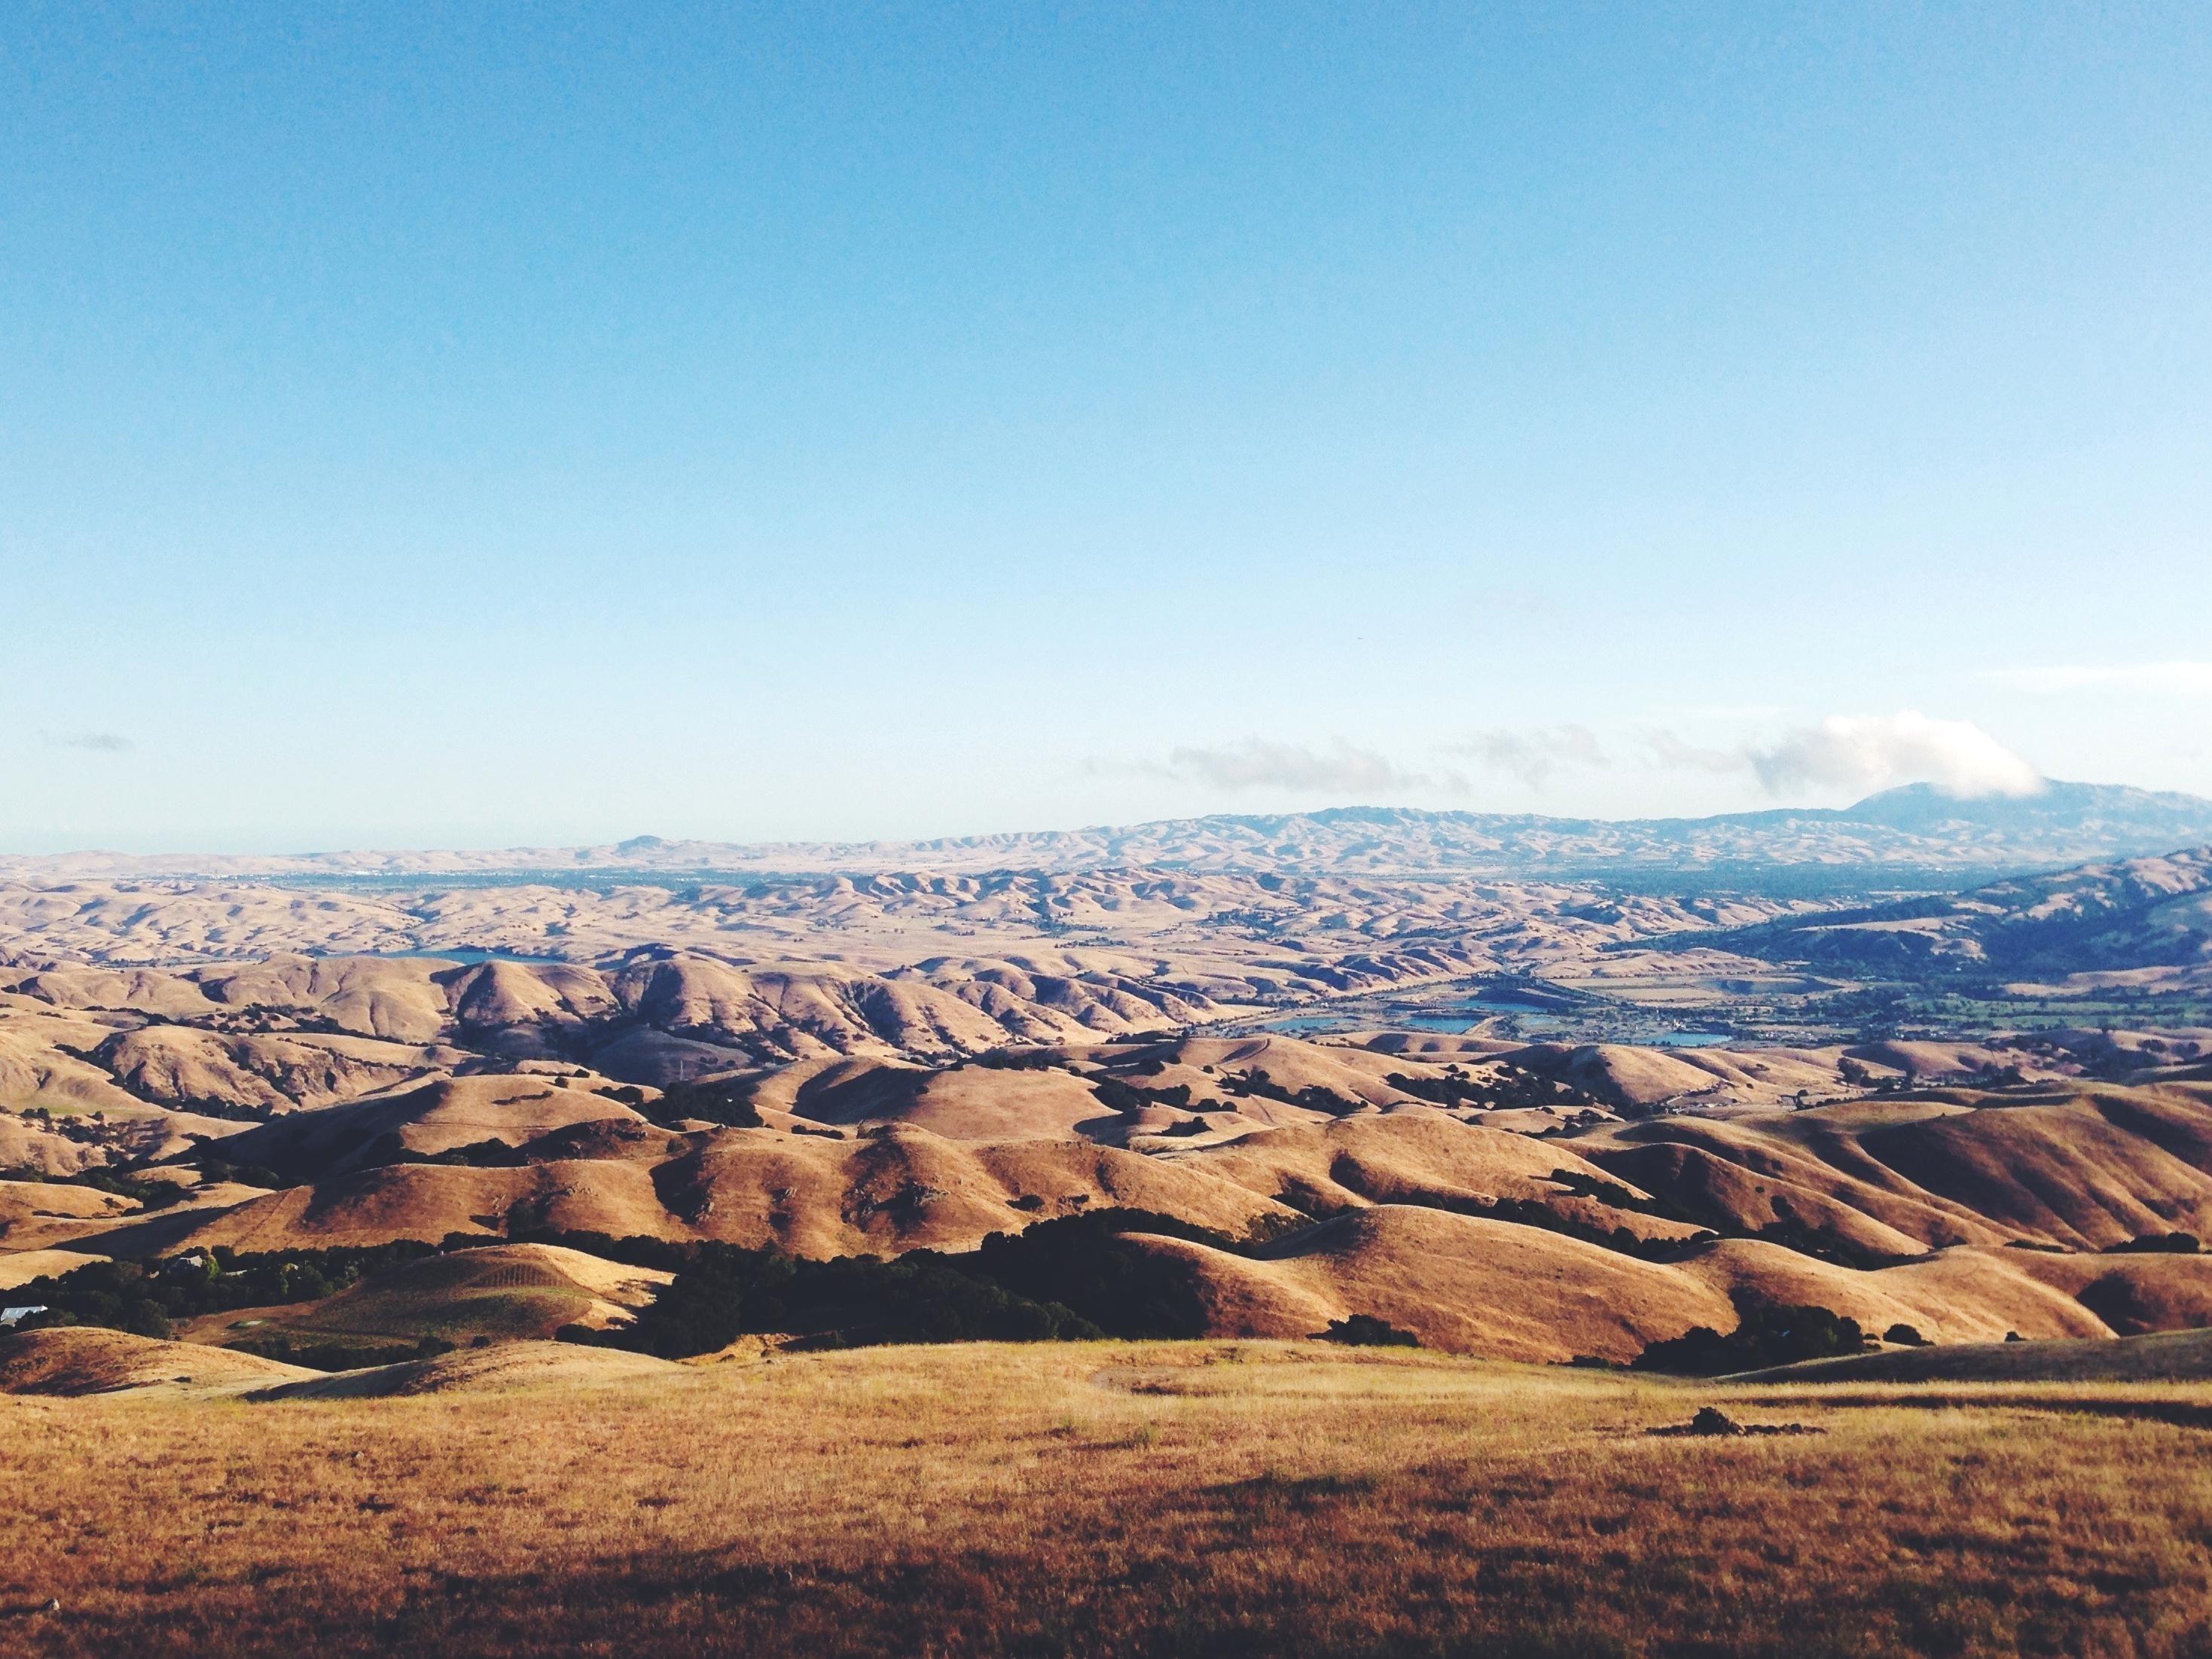 free picture  landscape  sky  desert  mountain  sky  cloud